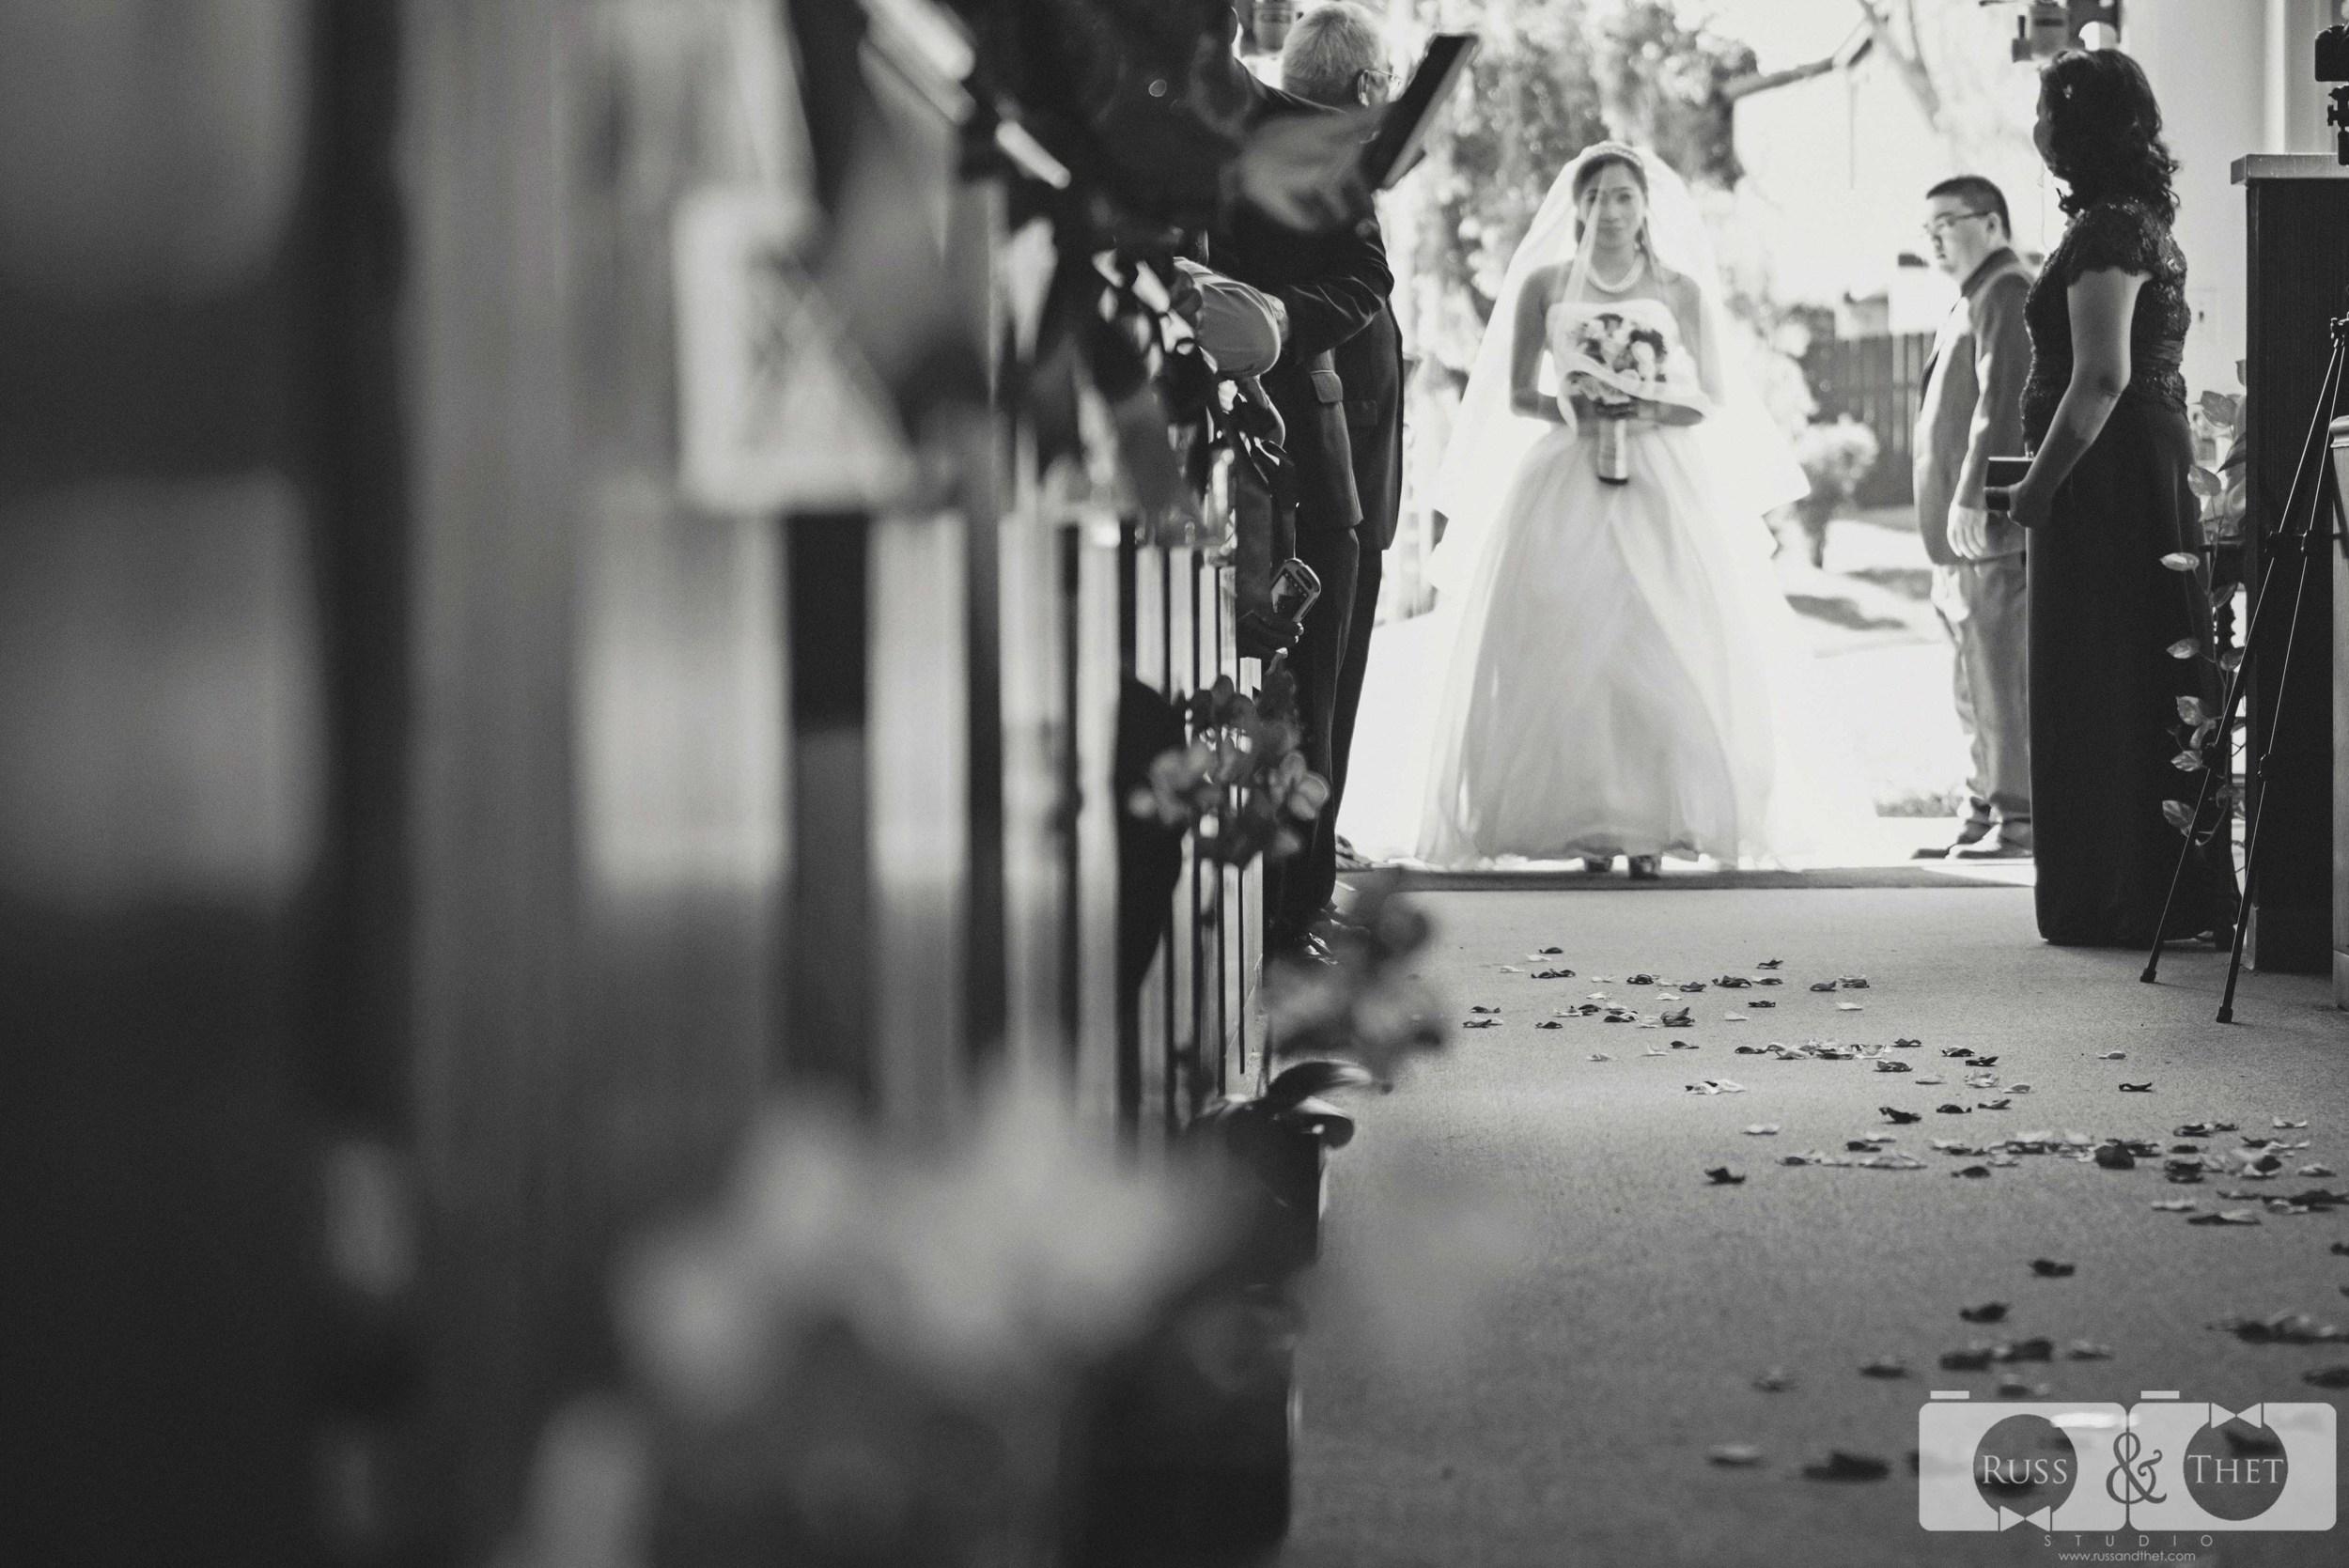 royal-palace-banquet-hall-glendale-wedding-32.JPG